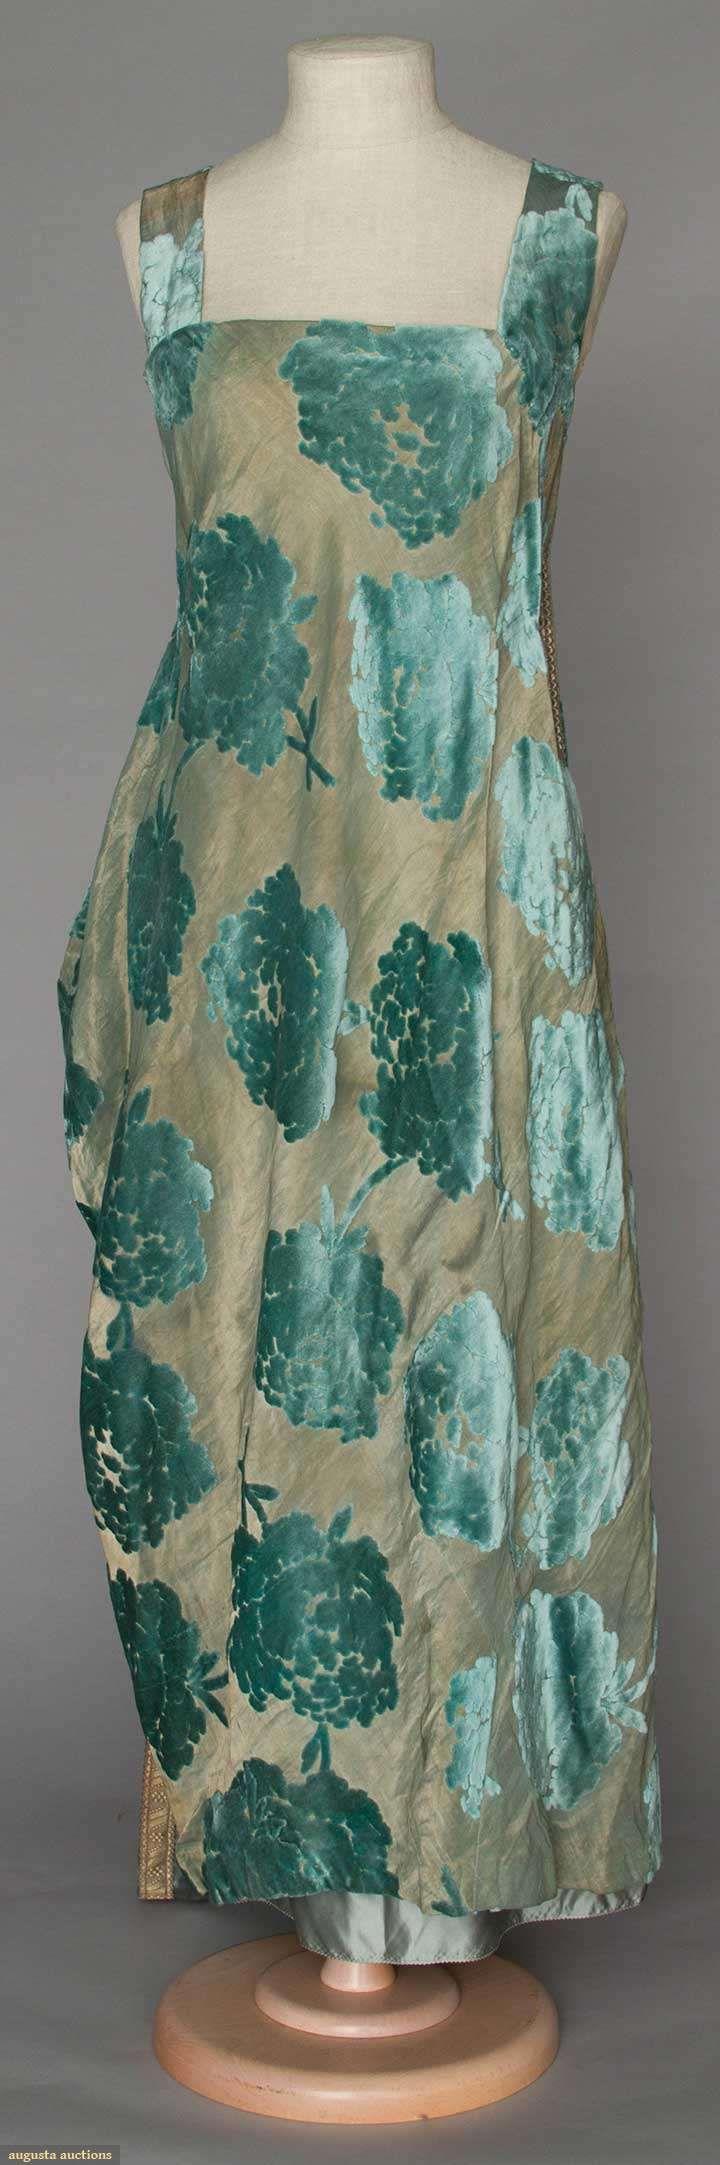 VELVET & LAME EVENING GOWN, 1920s | Augusta Auctions | Augusta Auctions